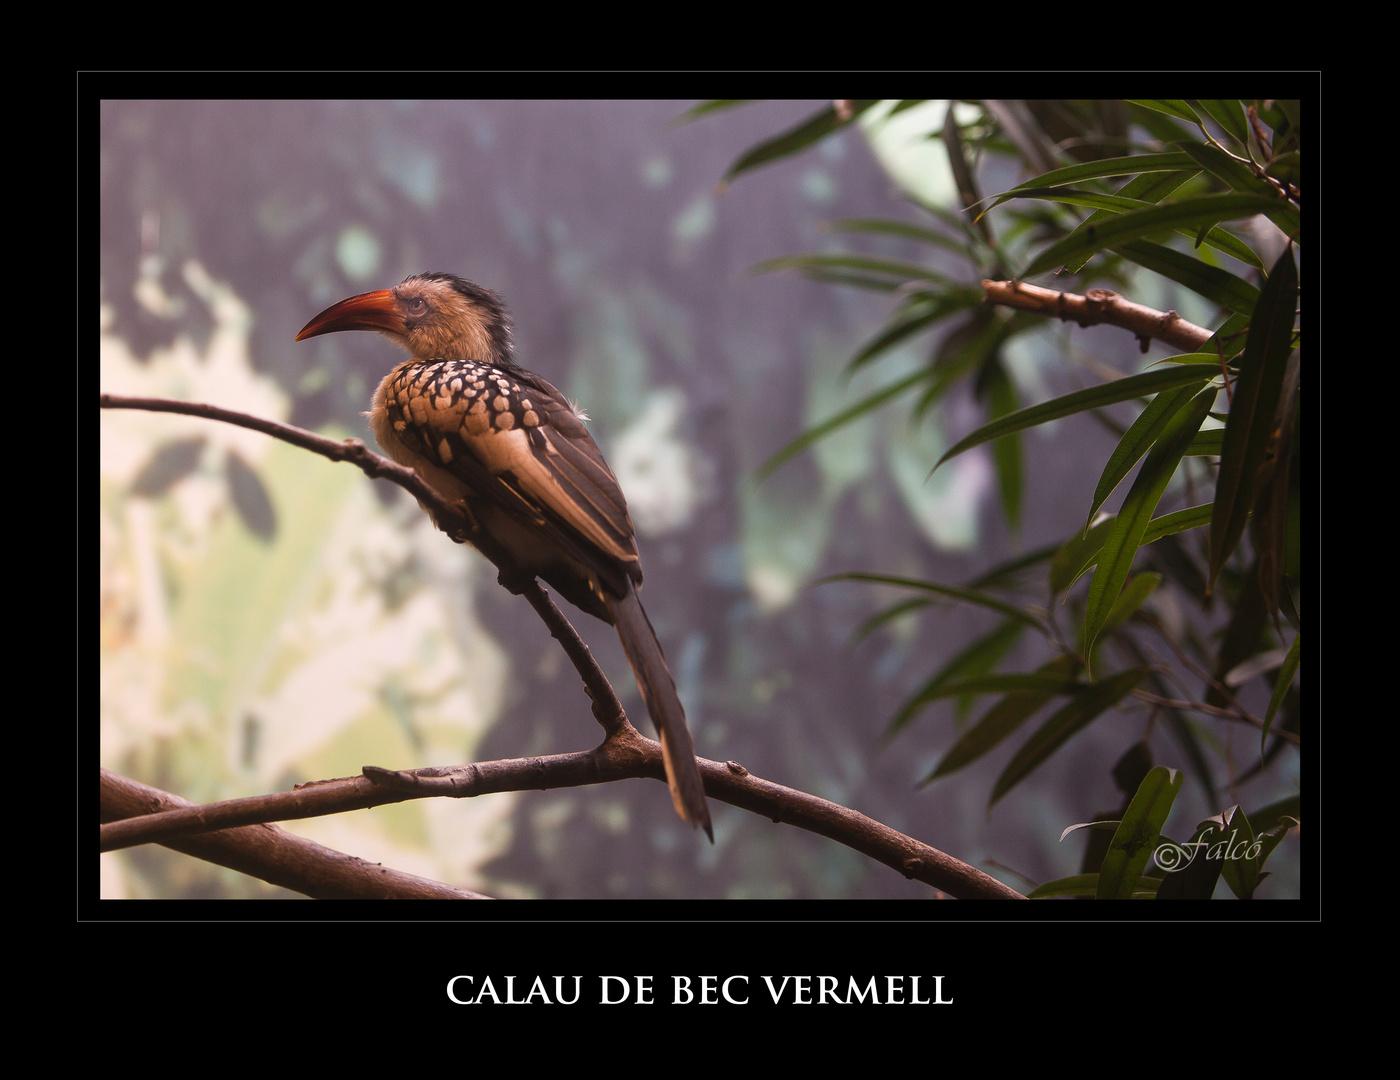 Safári fotográfico Zoo de BCN - IV